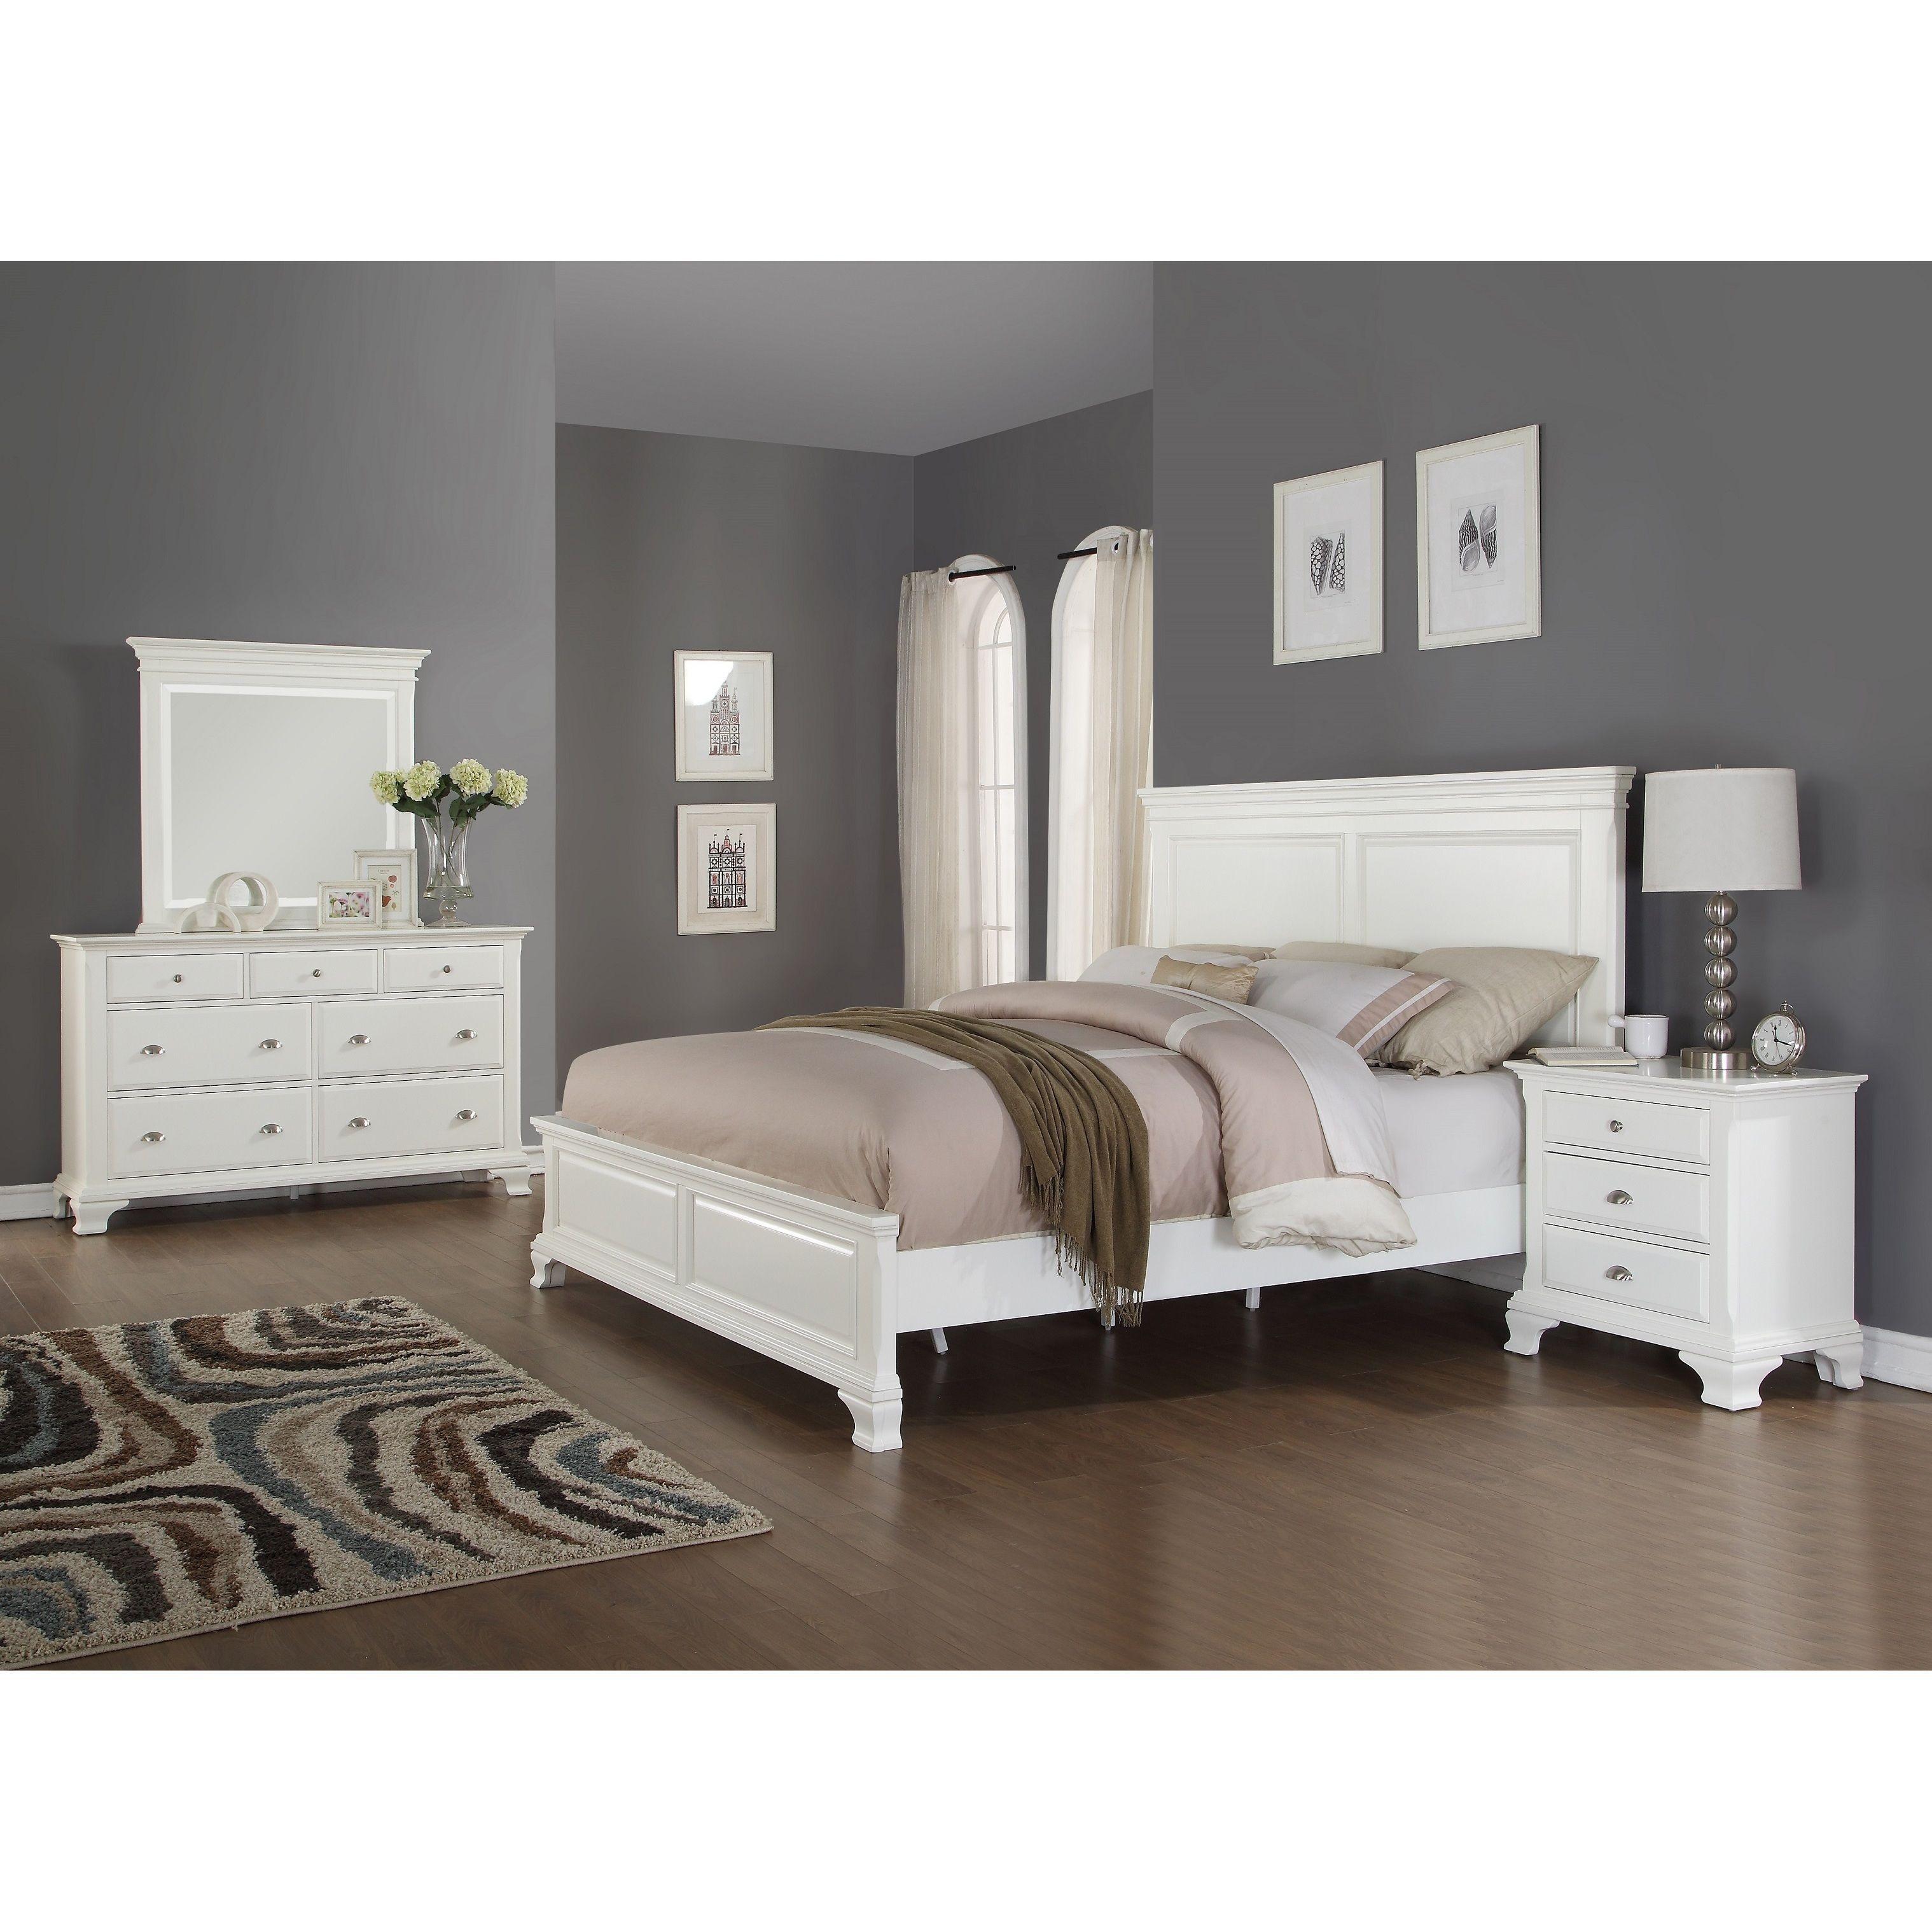 Laveno 012 Bedroom Furniture Set Includes Bed